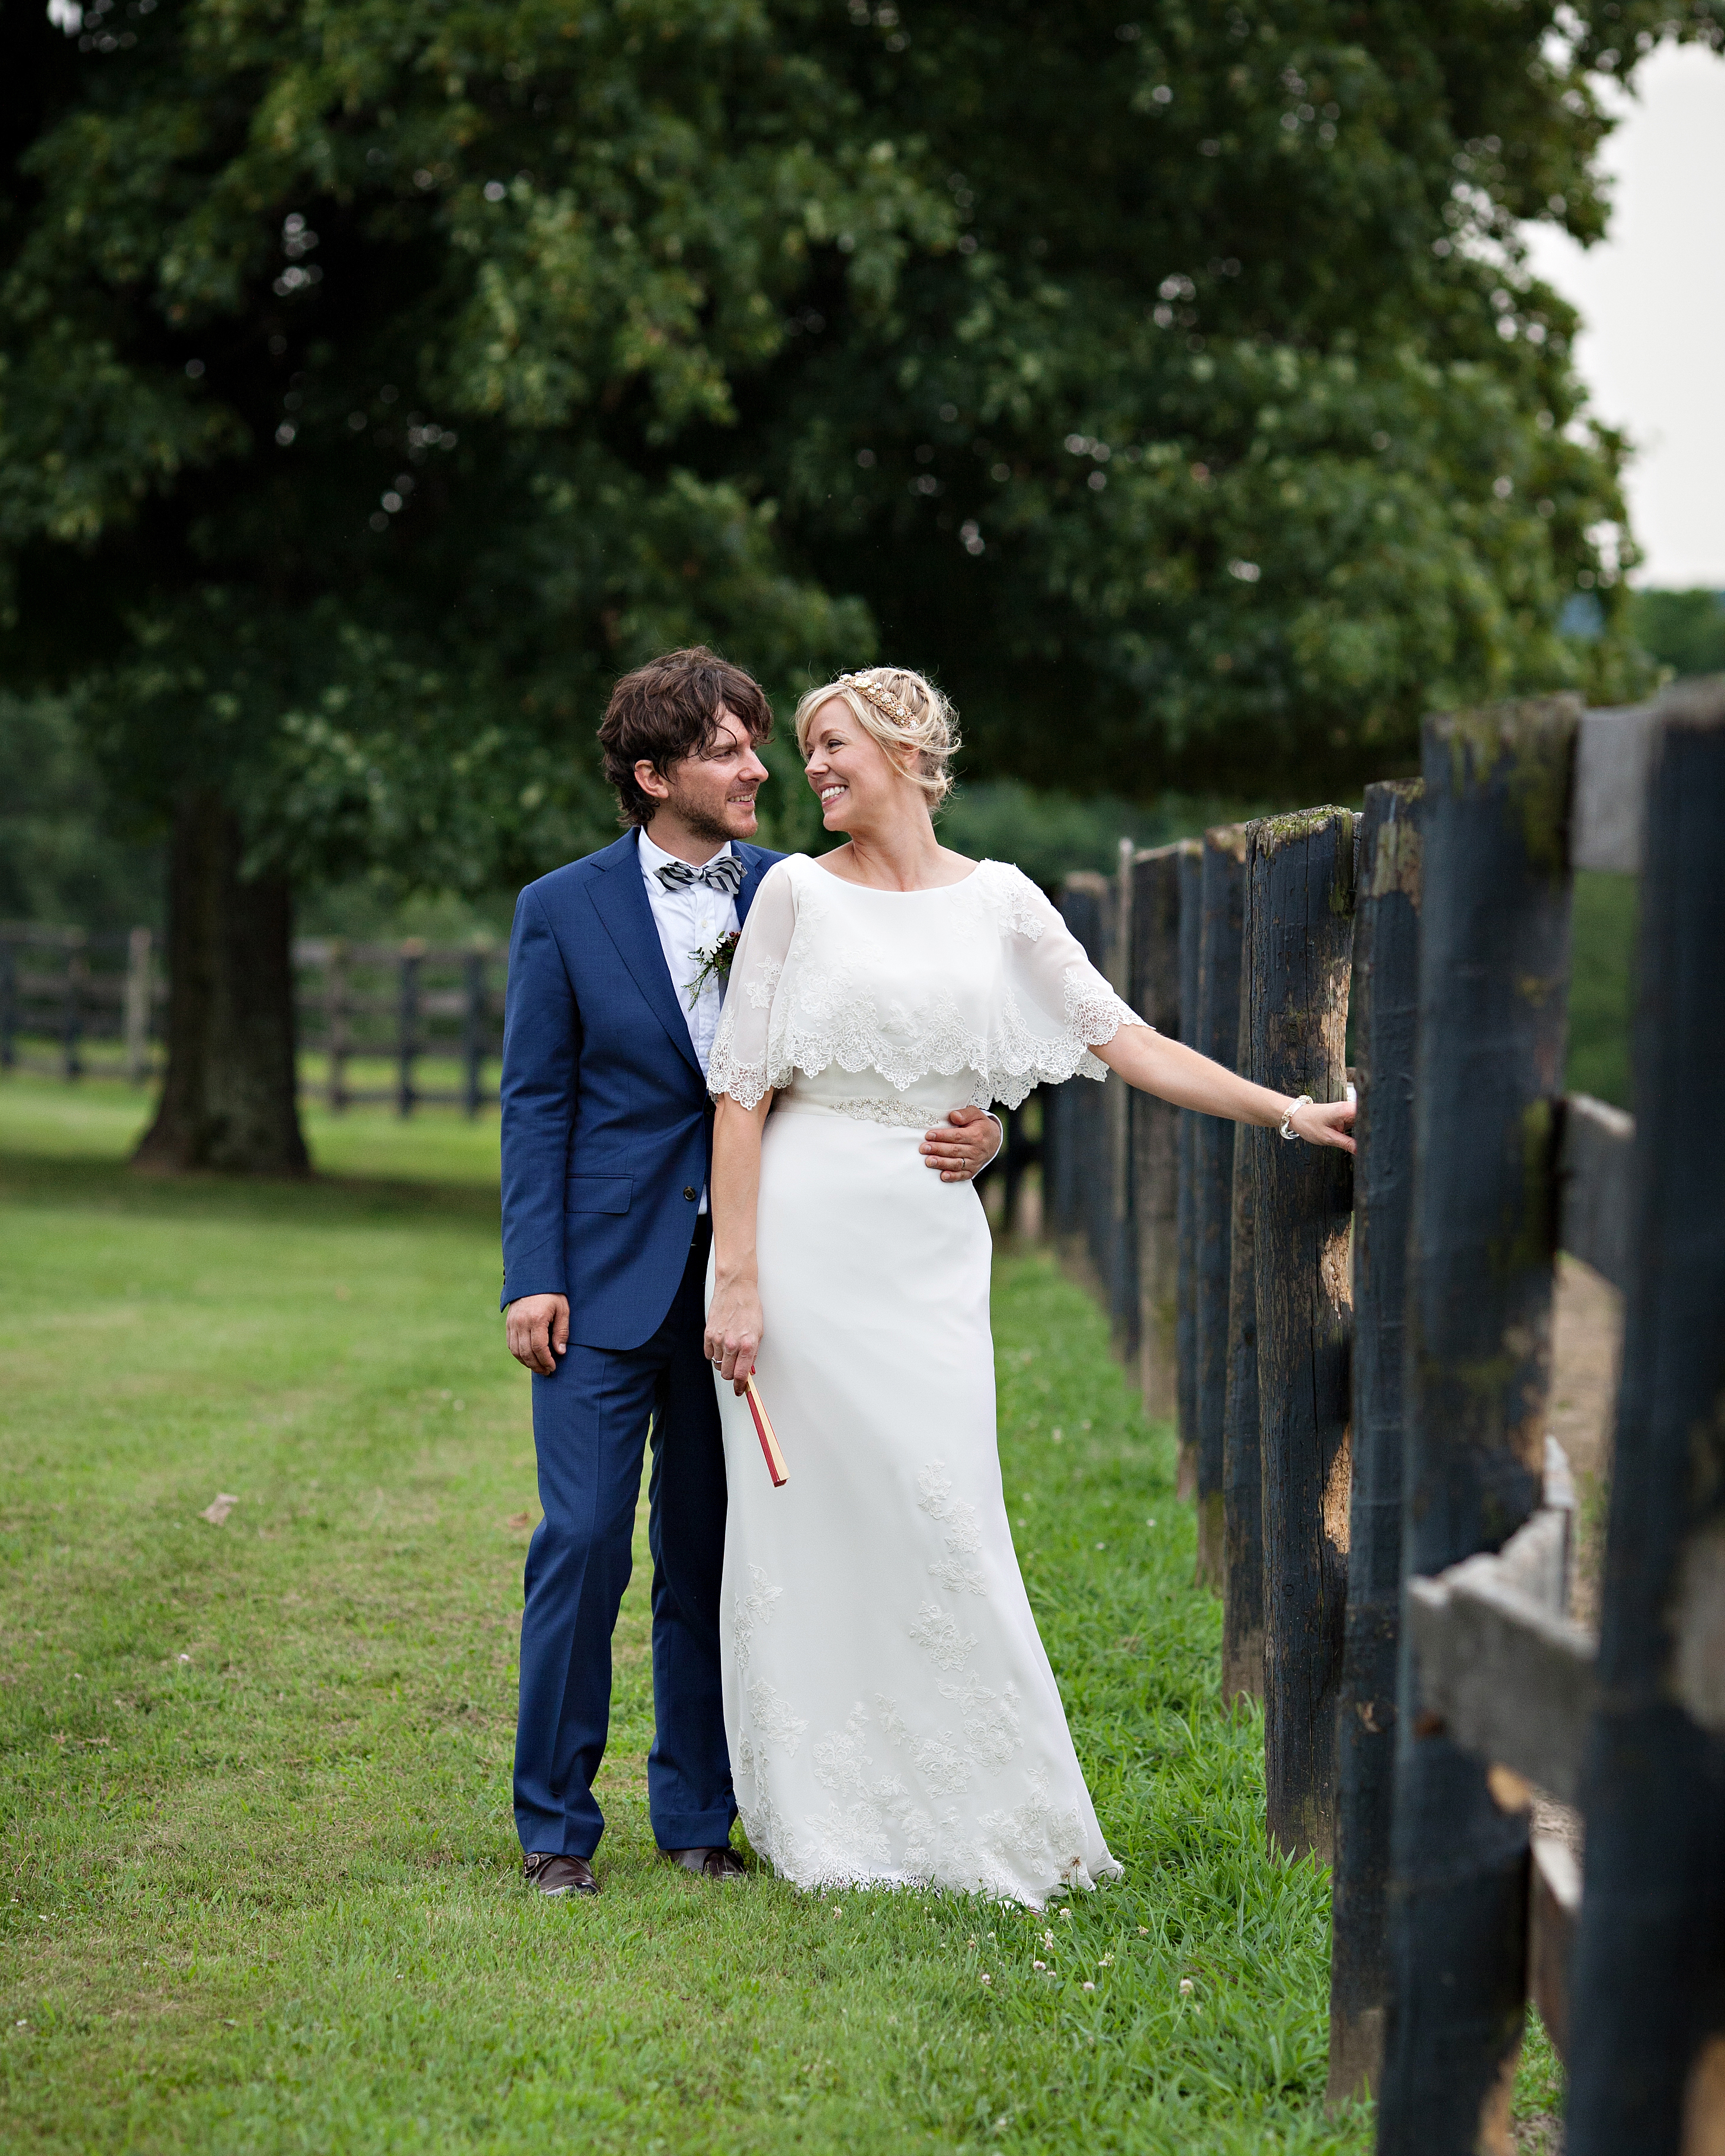 kristy-marc-wedding-portrait2-0414.jpg